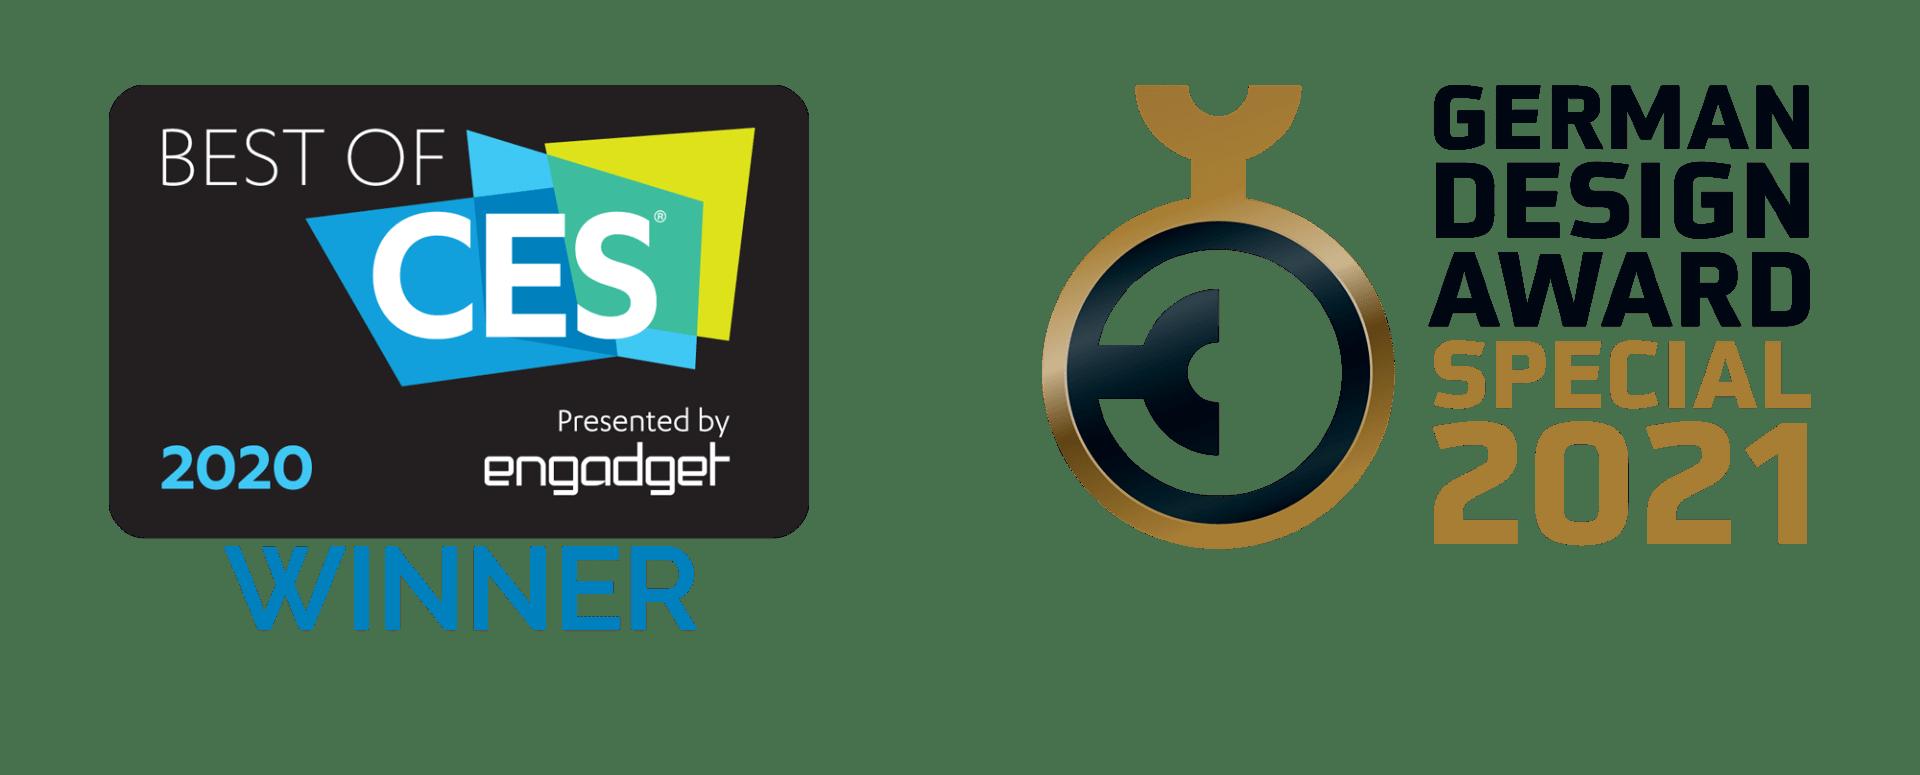 Best of CES 2020 Wallbox